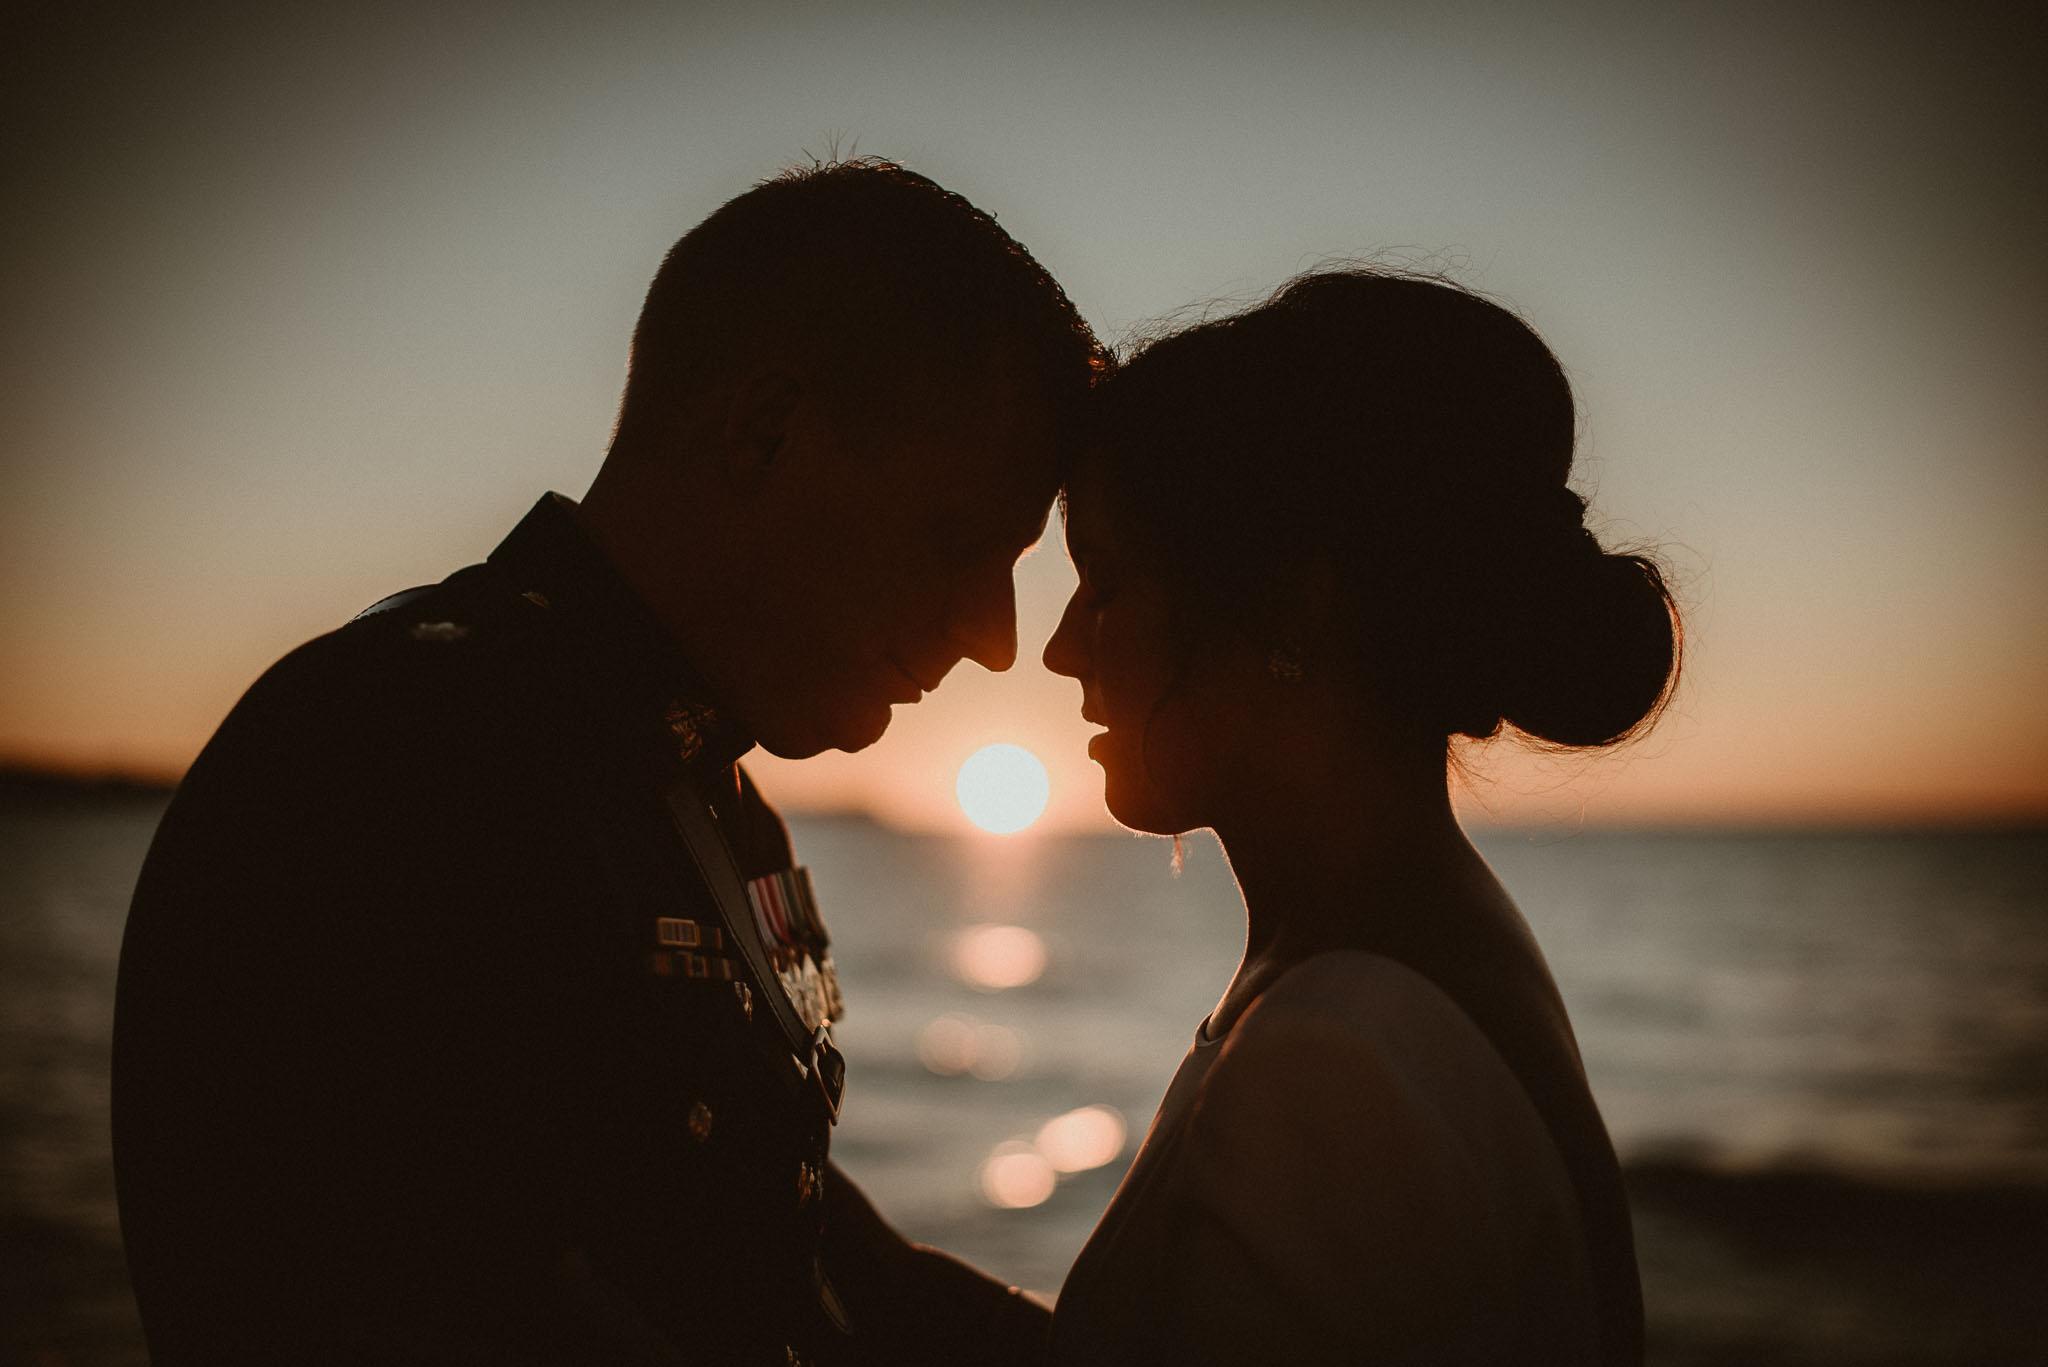 Sunset between bride and groom in silhouette.